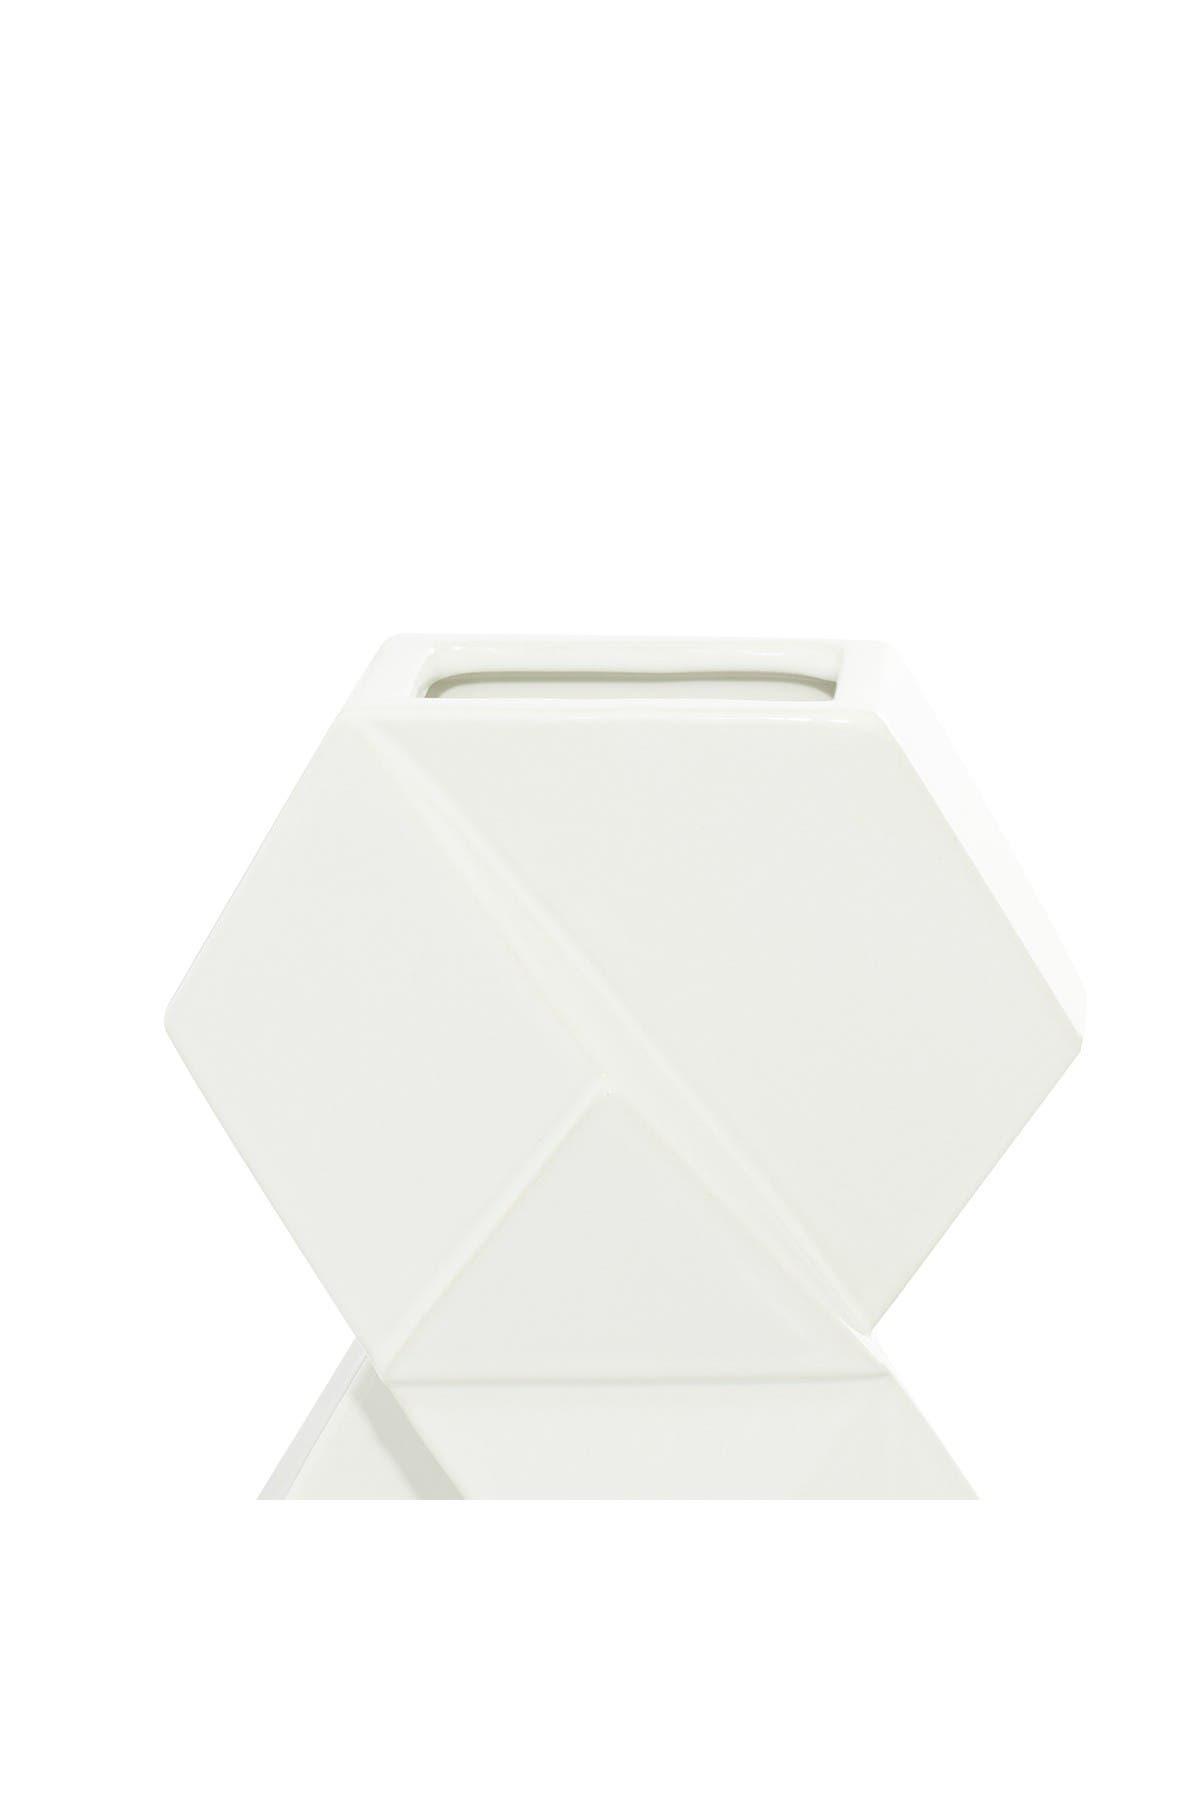 "Image of Willow Row White Ceramic Contemporary Vase - 16"" & 13"" - Set of 2"